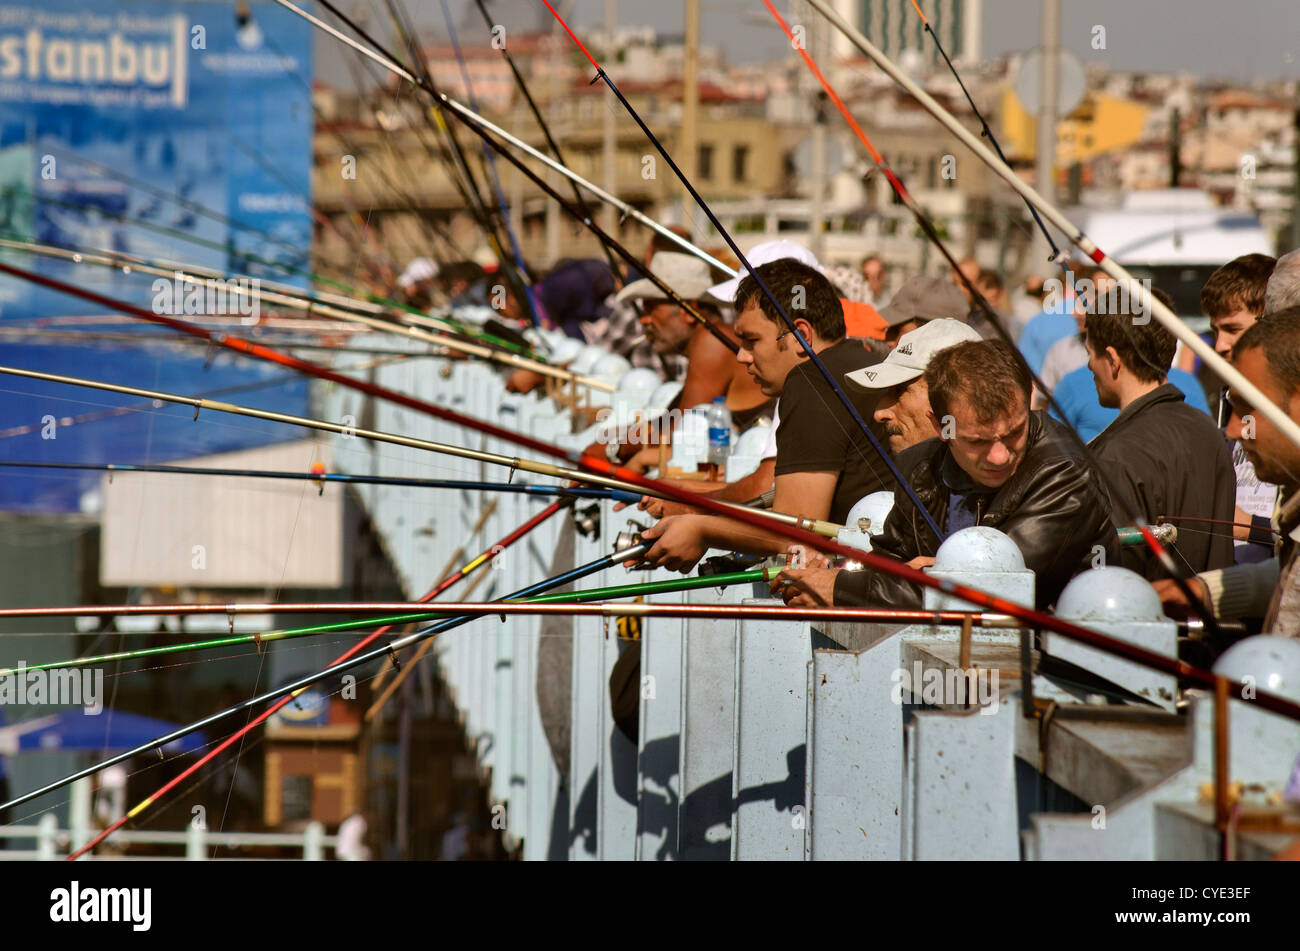 Fishermen of the Galata Bridge, Golden Horn, Istanbul, Turkey - Stock Image